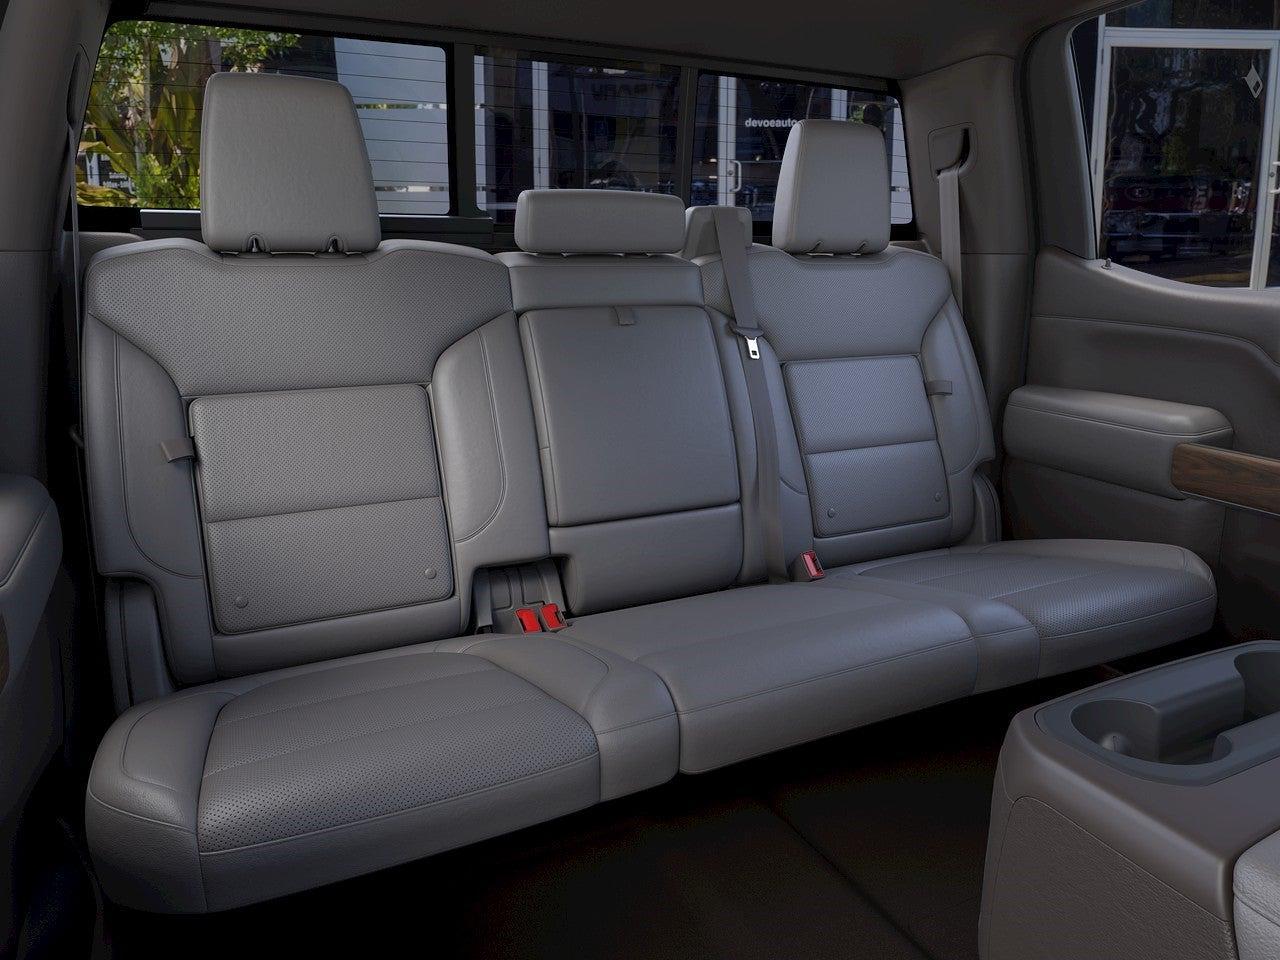 2021 Sierra 1500 Crew Cab 4x4,  Pickup #T21421 - photo 34